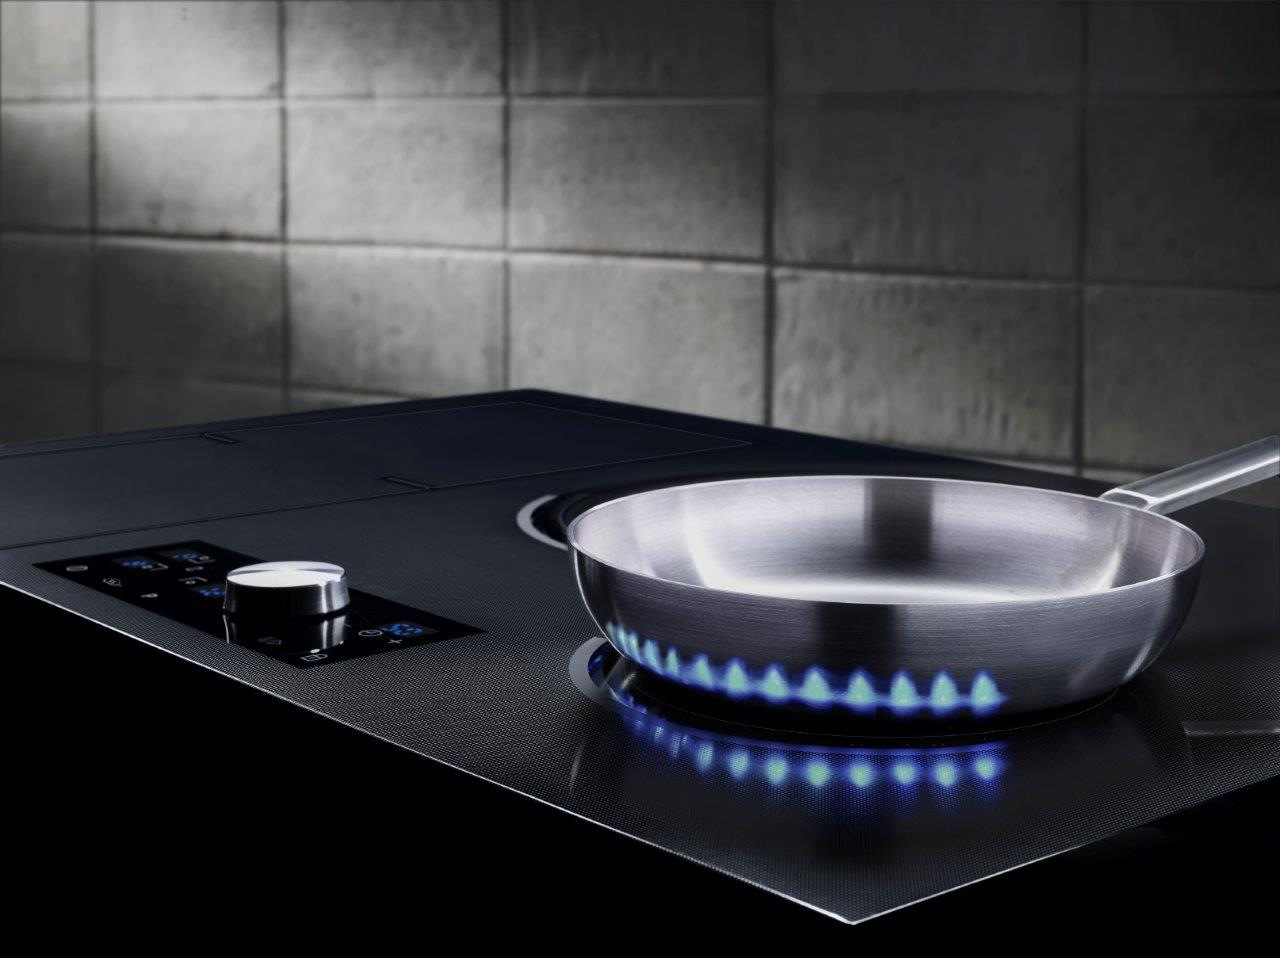 Cozinha premium Chef Collection, da Samsung. Chama virtual